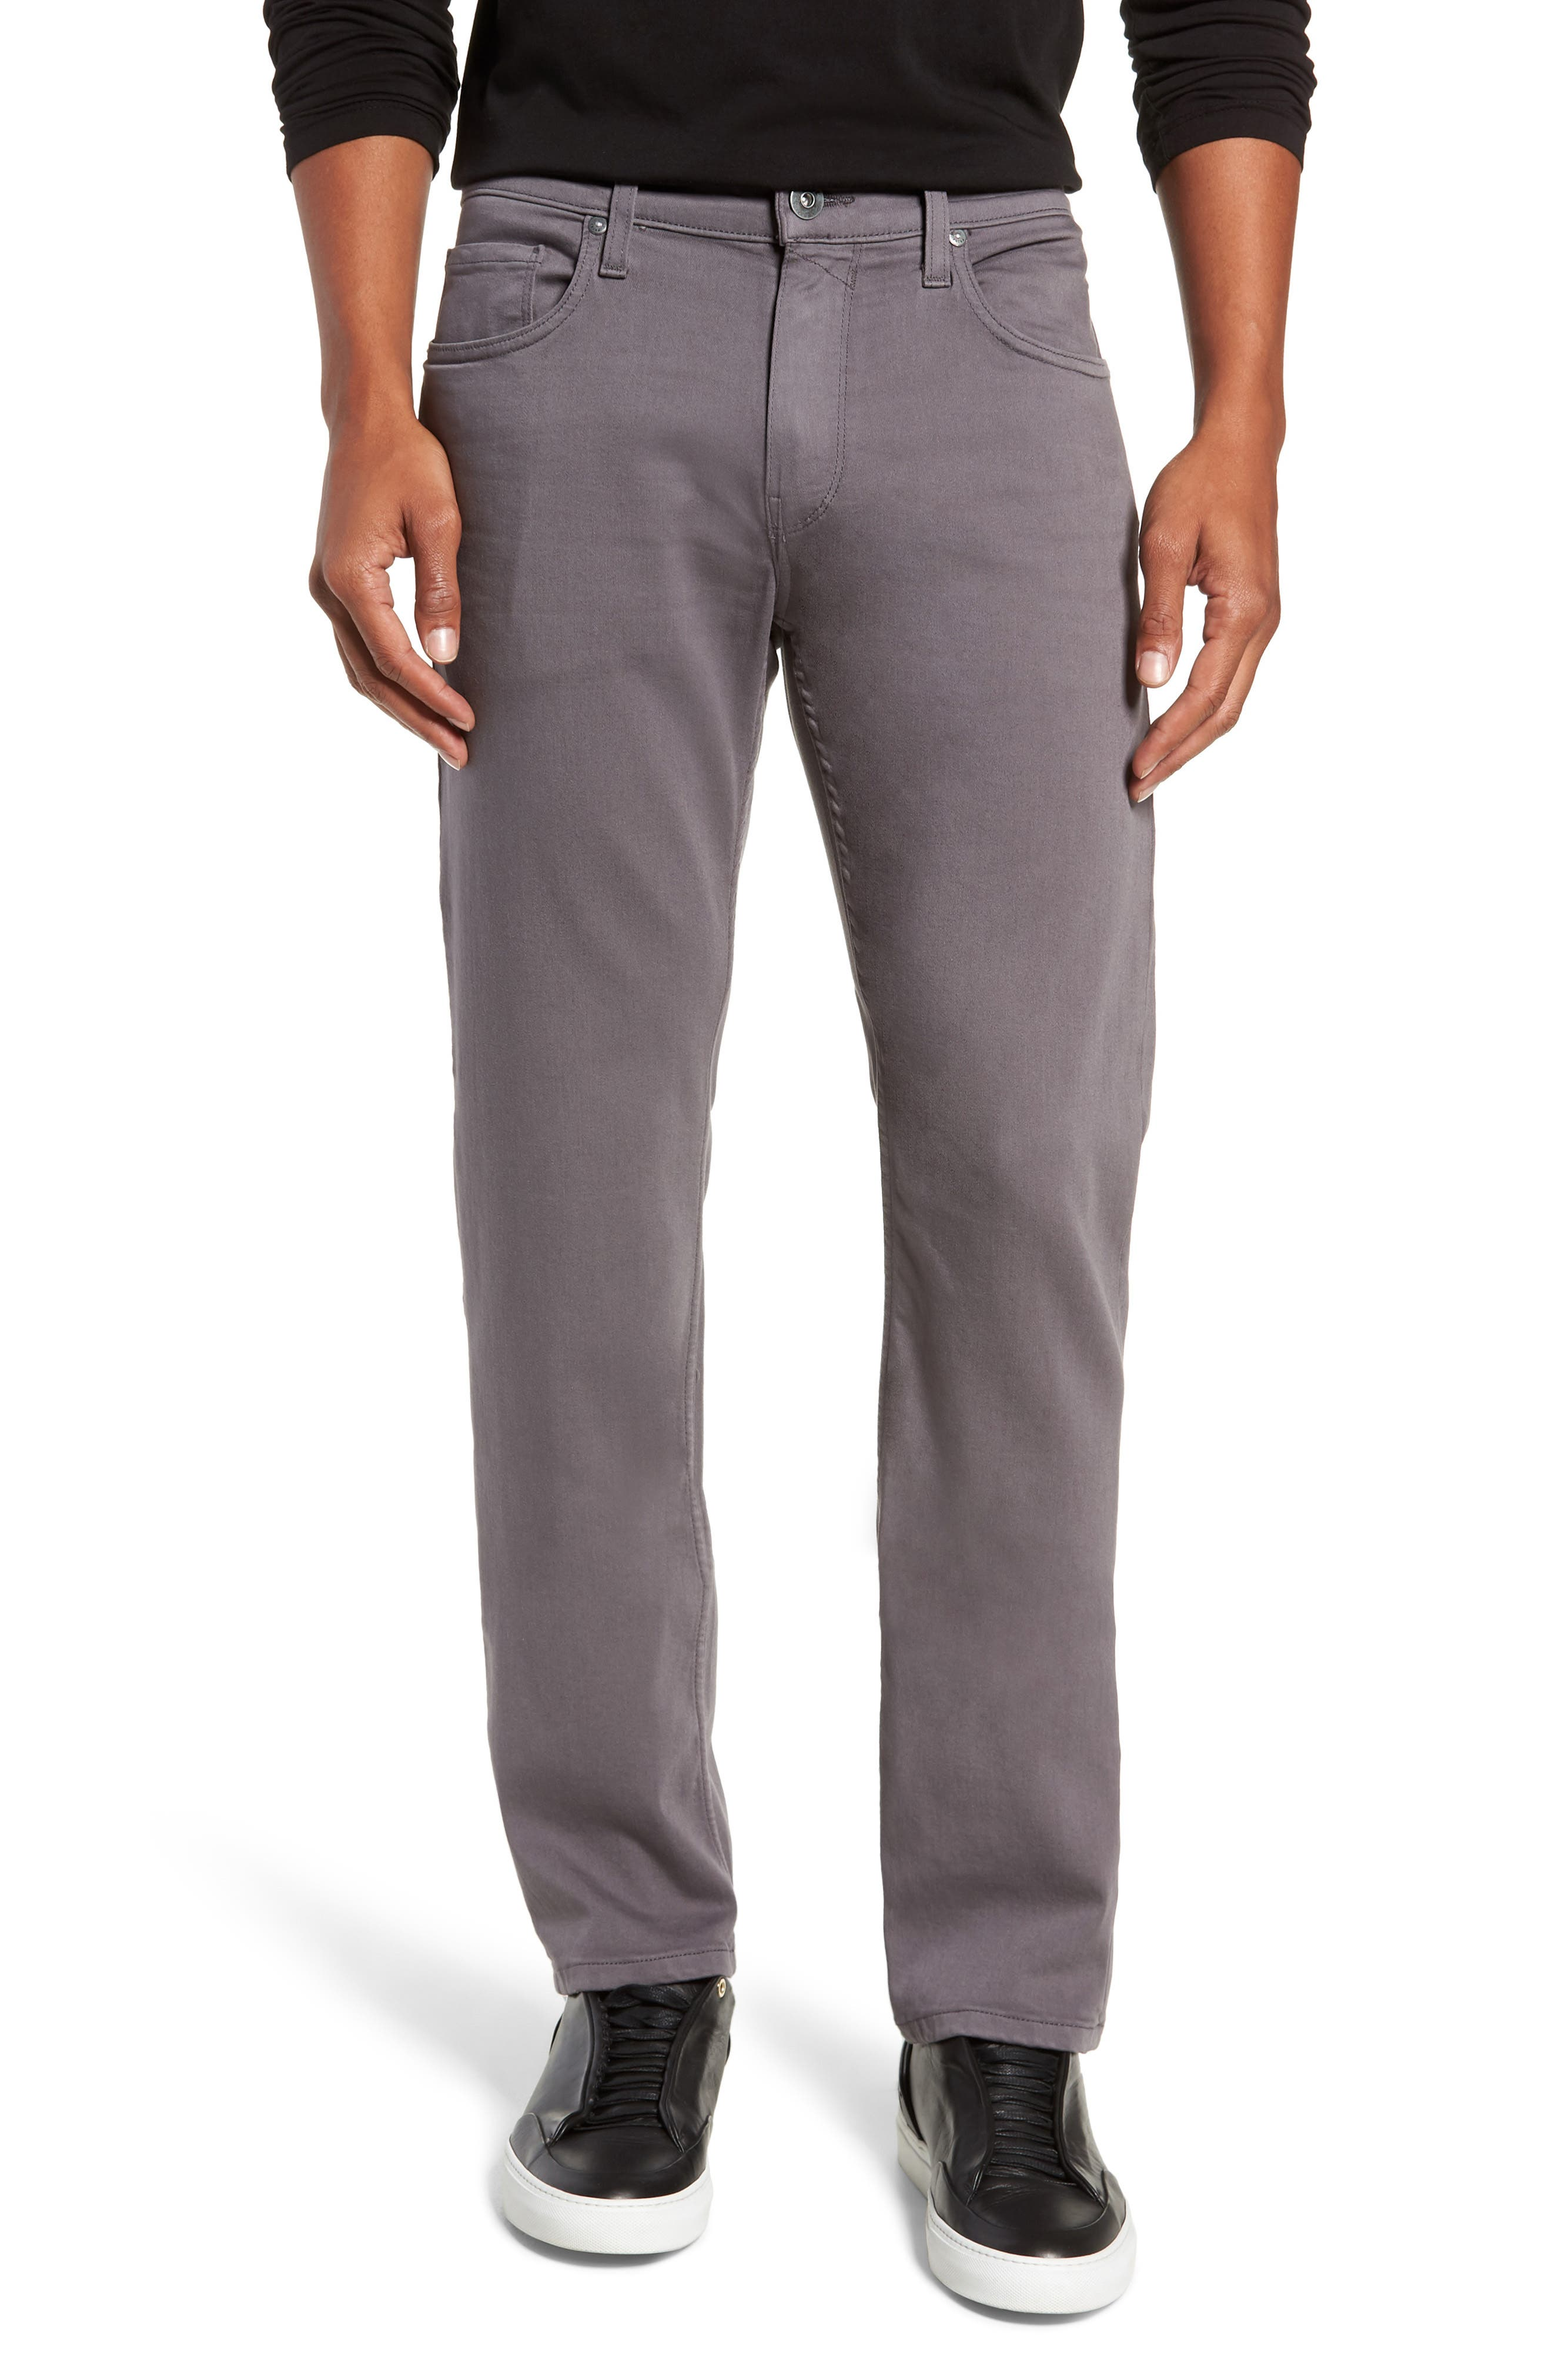 Transcend - Federal Slim Straight Leg Jeans,                             Main thumbnail 1, color,                             030